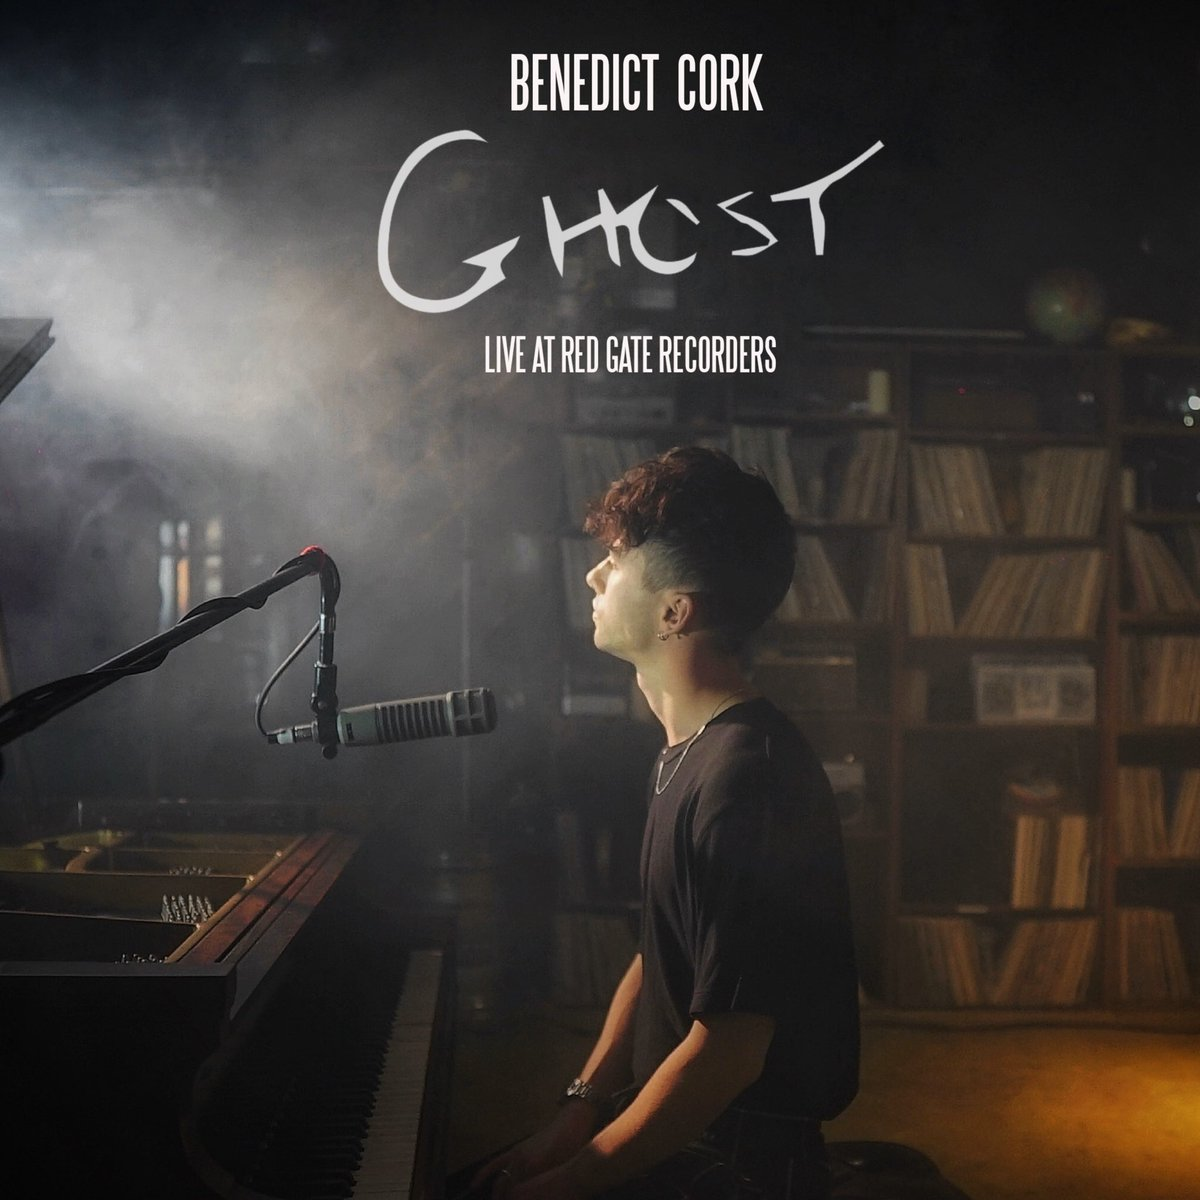 BENEDICT CORK RELEASES DEBUT SINGLE 'GHOST' ile ilgili görsel sonucu